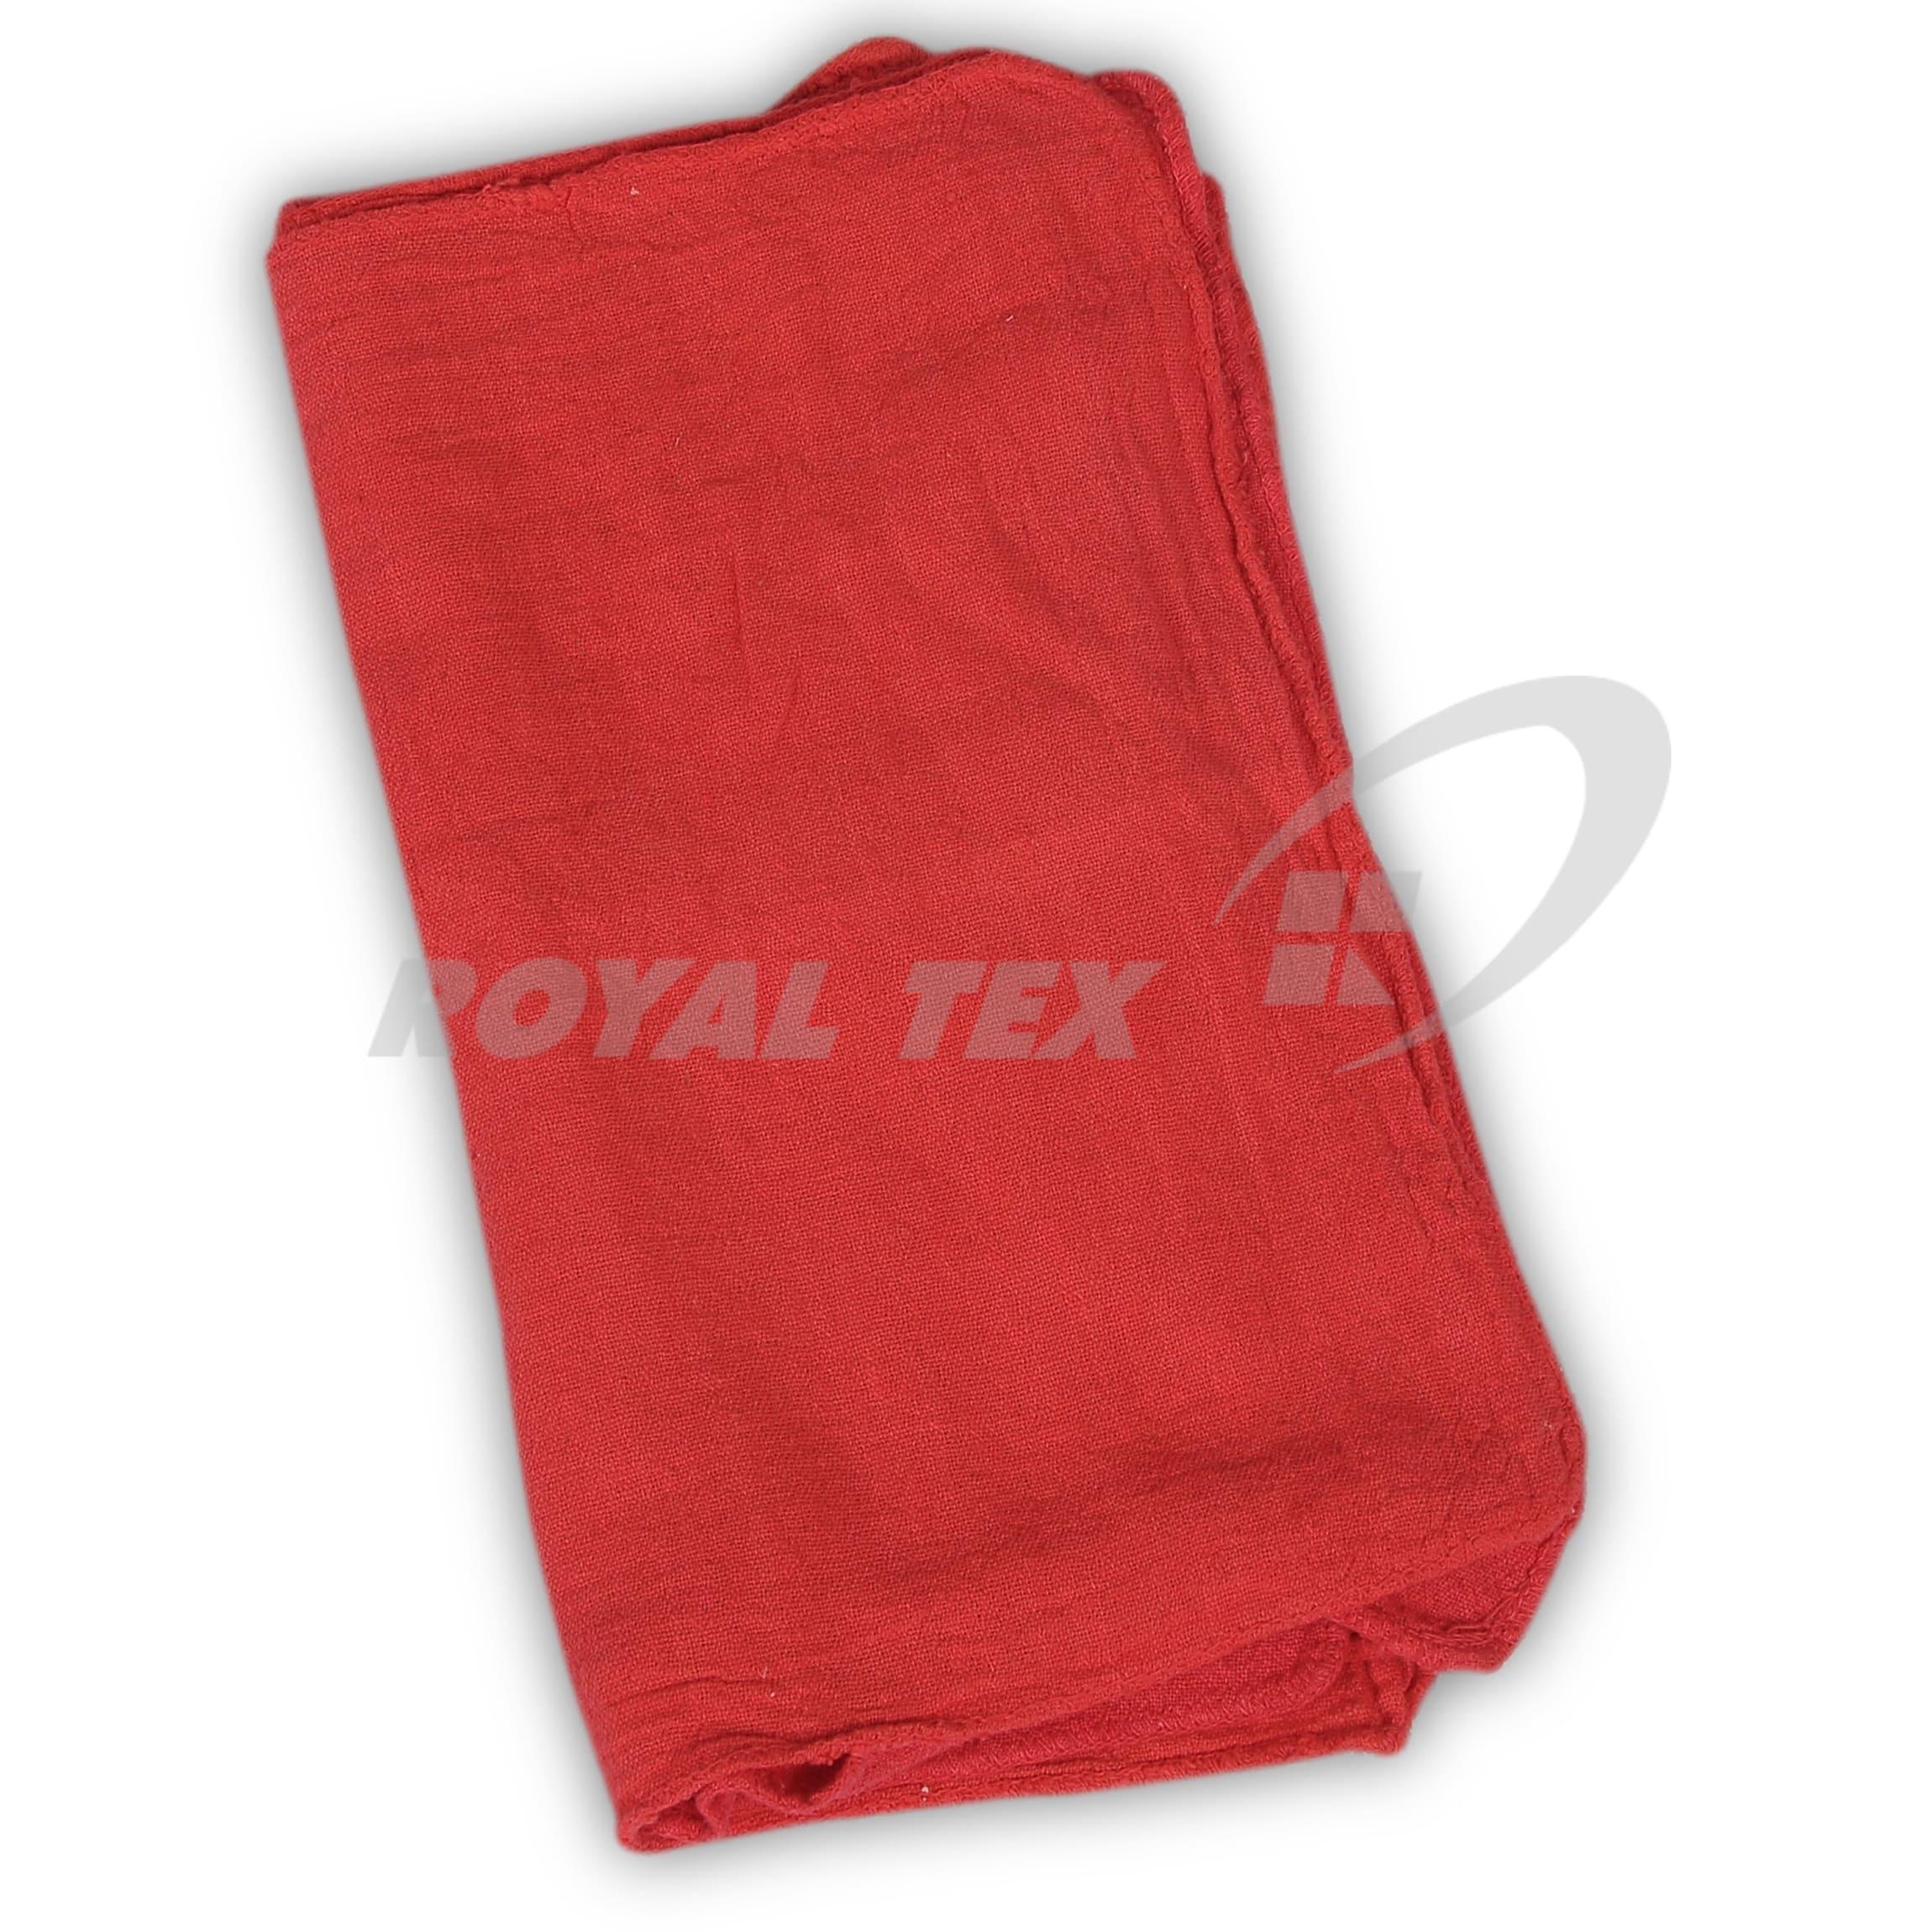 Shop Towel - Red color